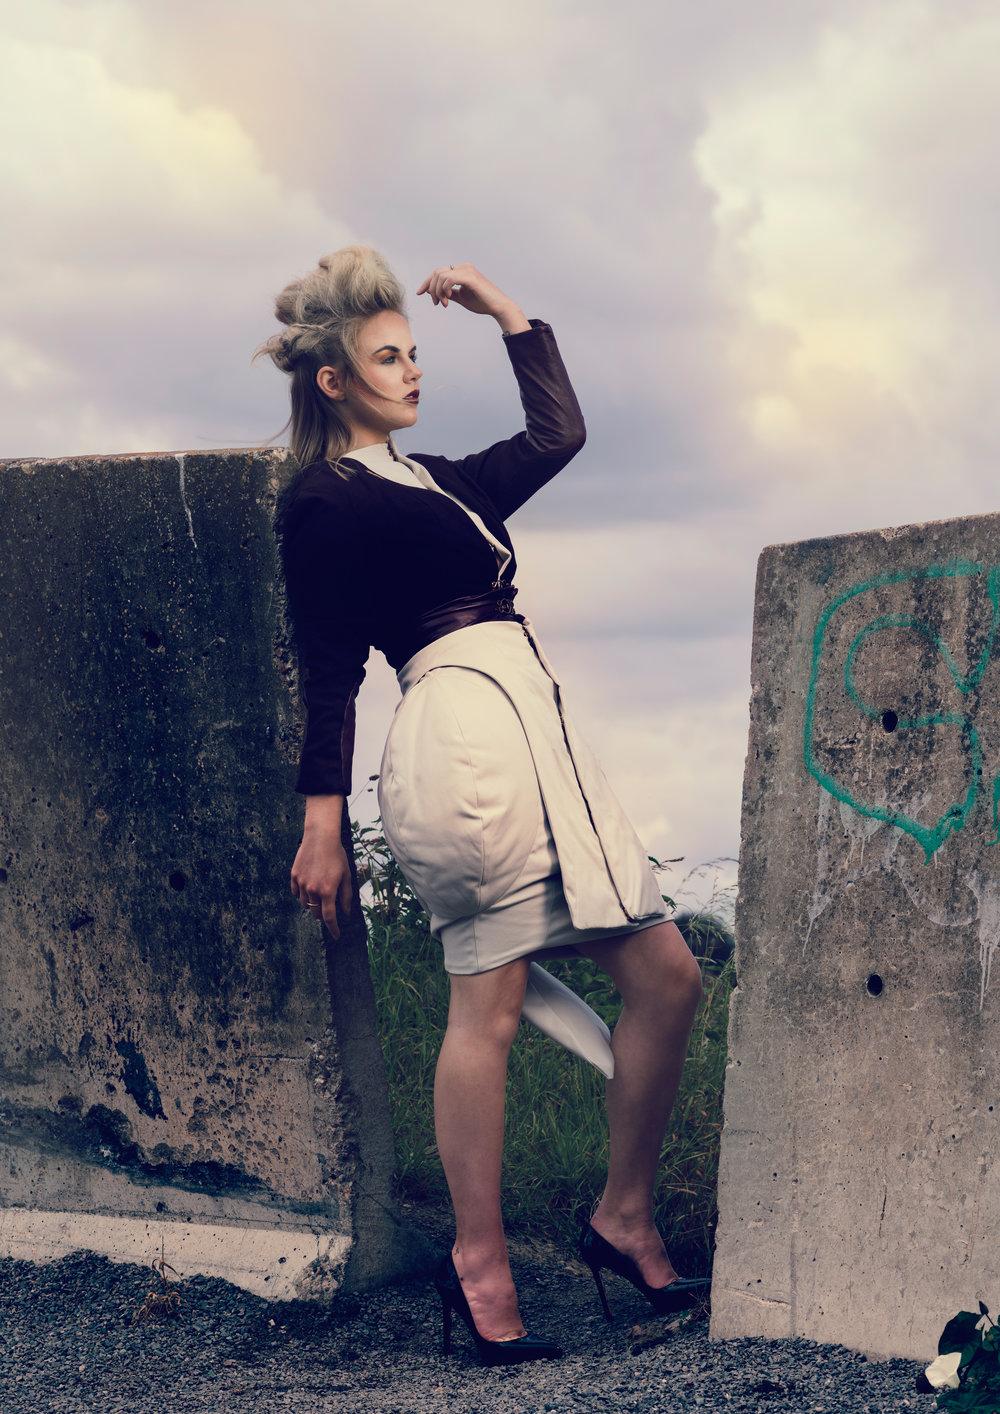 zaramia-ava-zaramiaava-leeds-fashion-designer-ethical-sustainable-taupe-versatile-drape-wrap-top-cowl-structure-padding-burgundy-crop-jacket-styling-location-womenswear-photoshoot-5